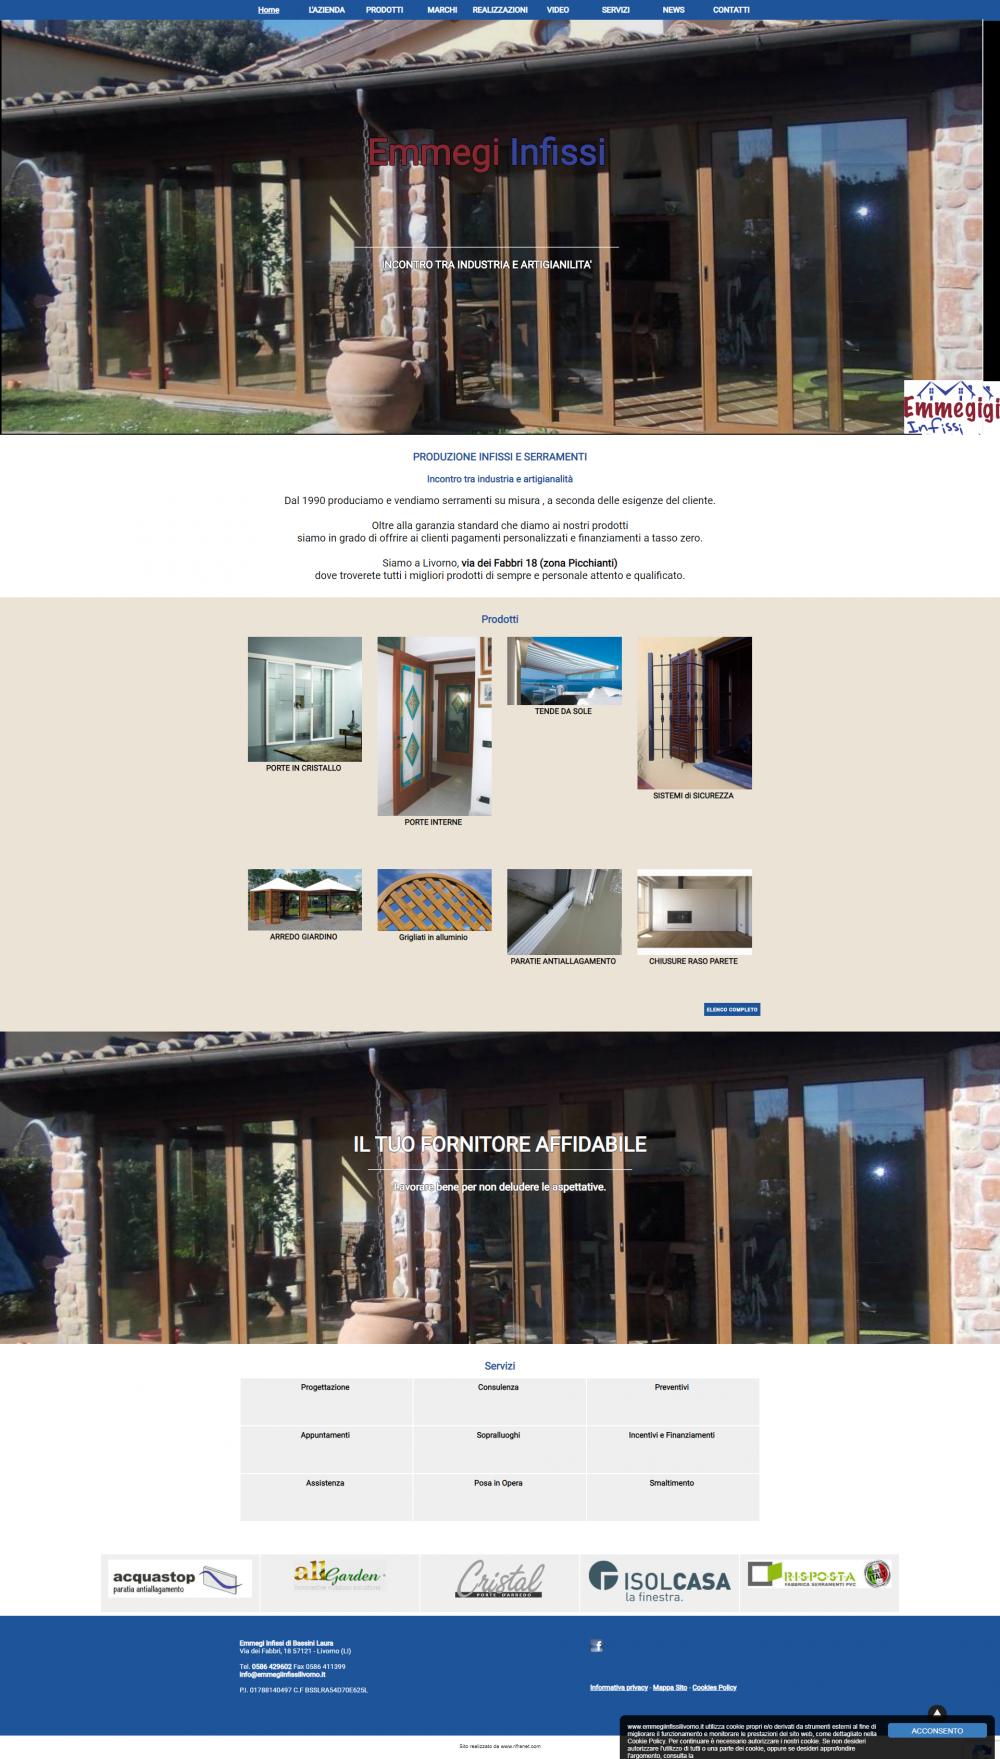 sito web emmegi infissi livorno dopo restyling